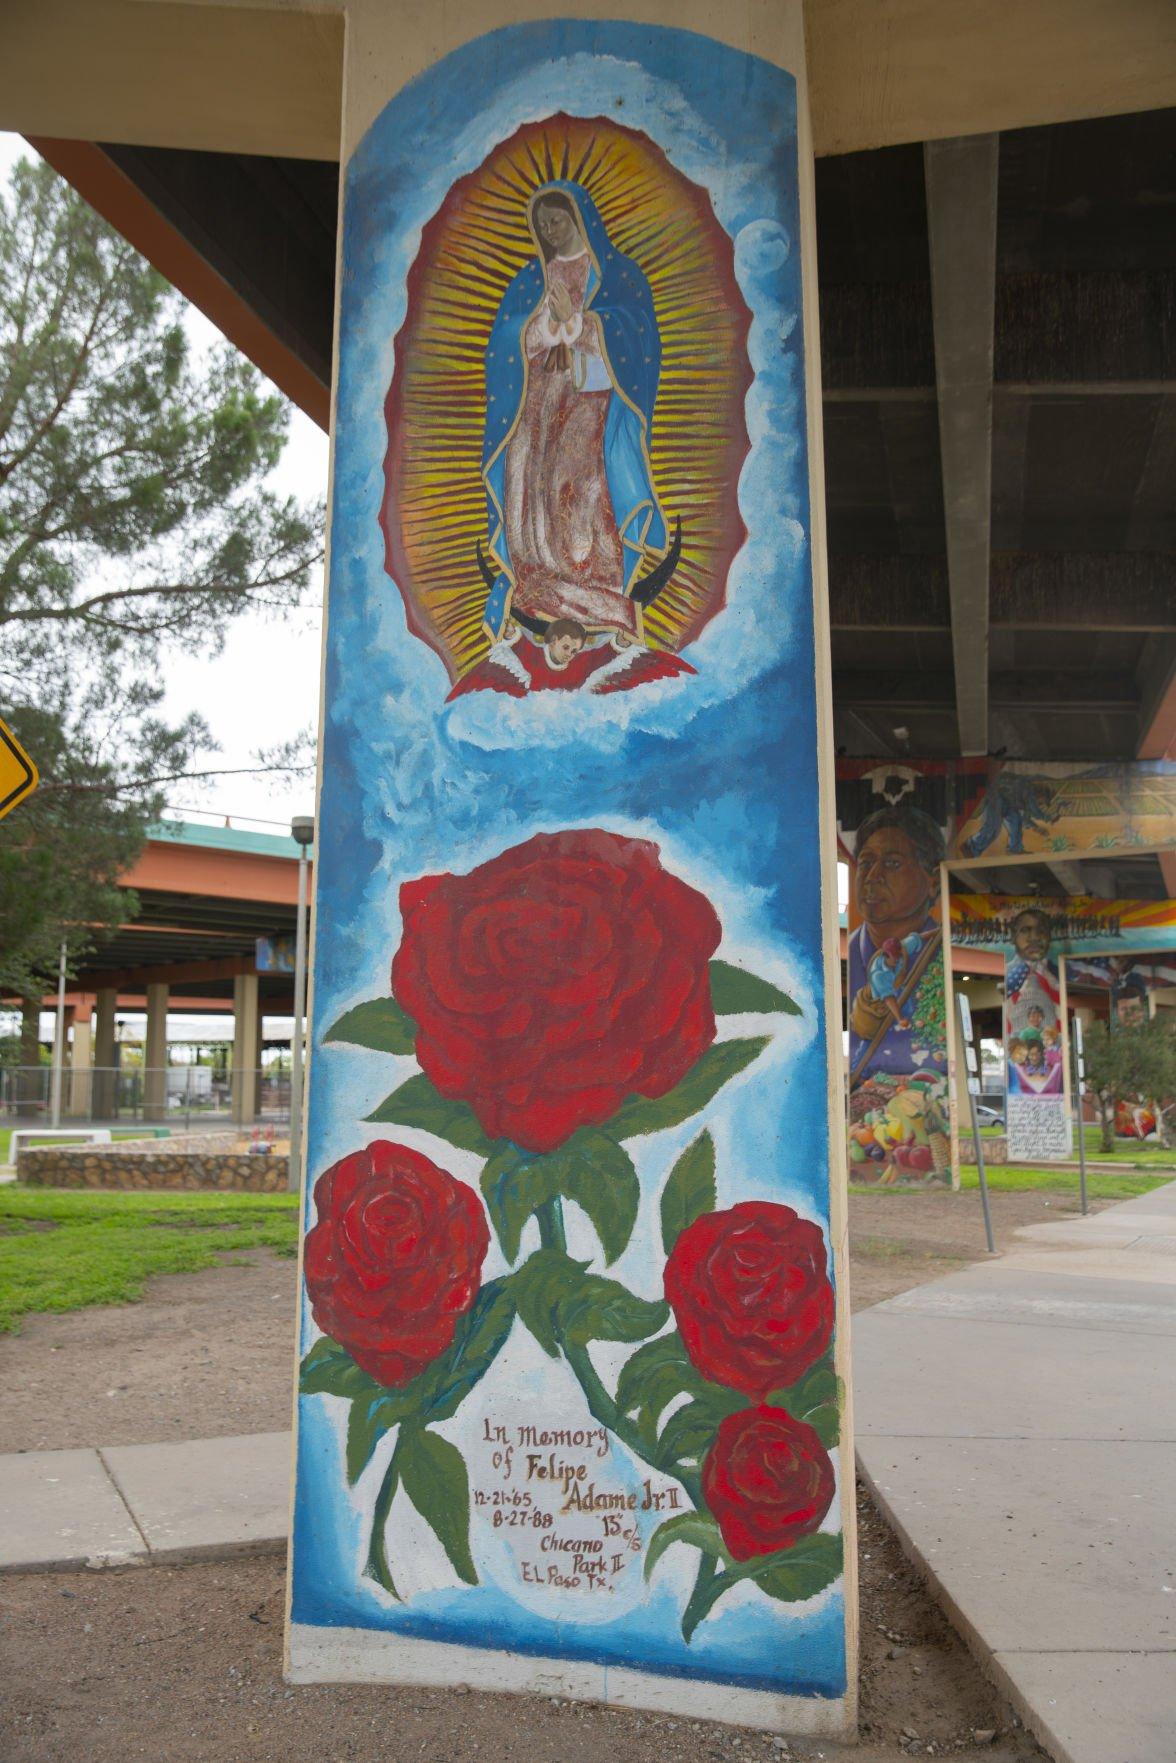 Cultural artwork to be demolished for highway 2